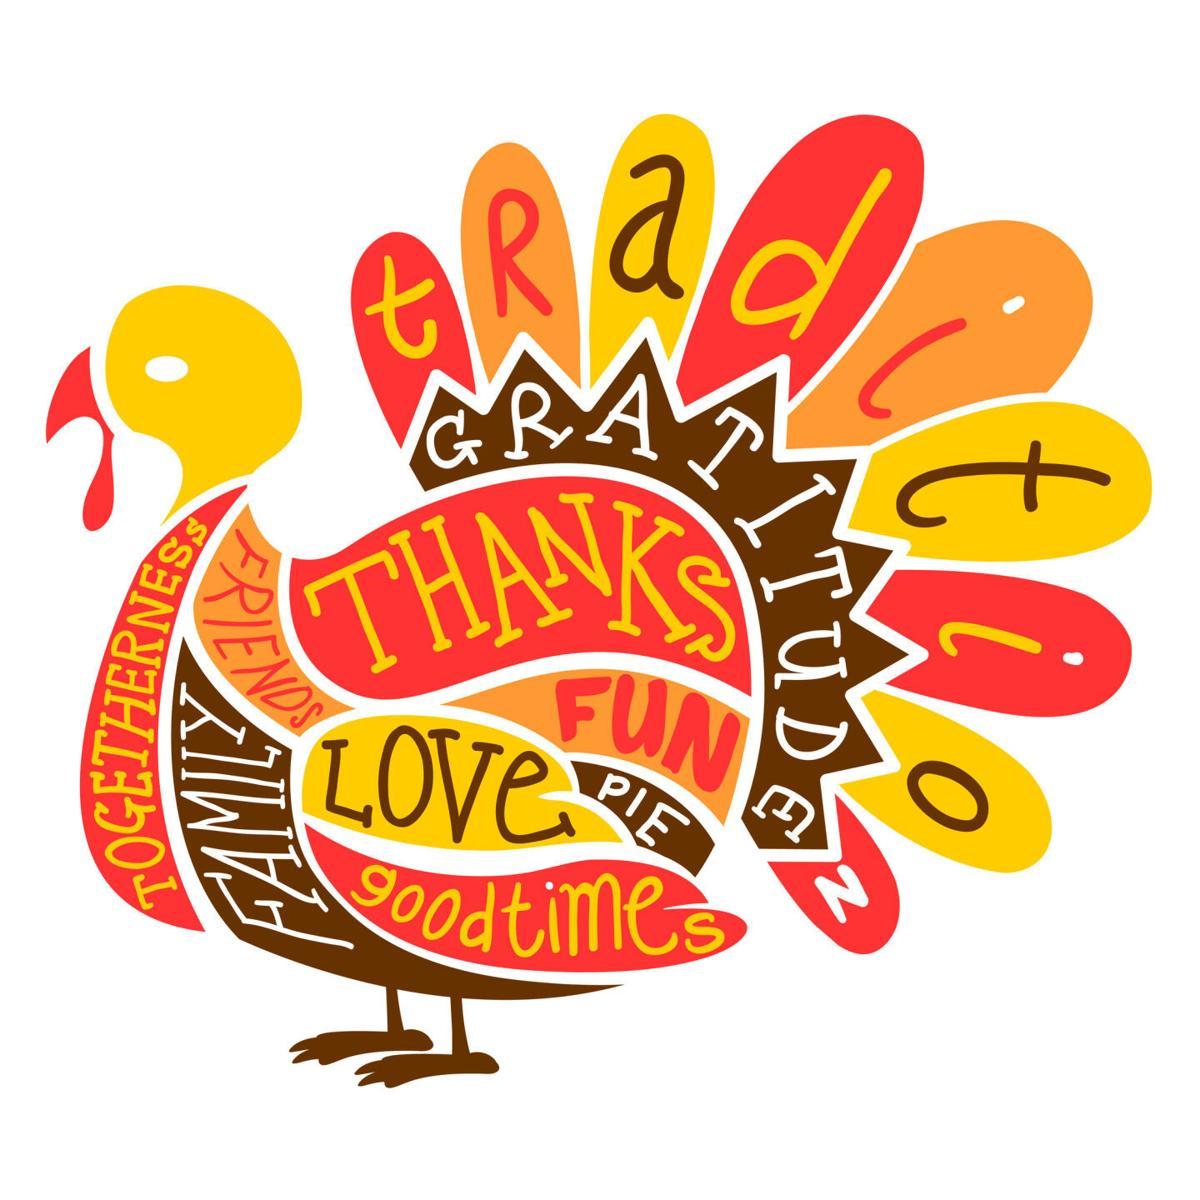 Despite Covid 19 Register Readers Share Reasons For Feeling Gratitude This Thanksgiving Local News Napavalleyregister Com